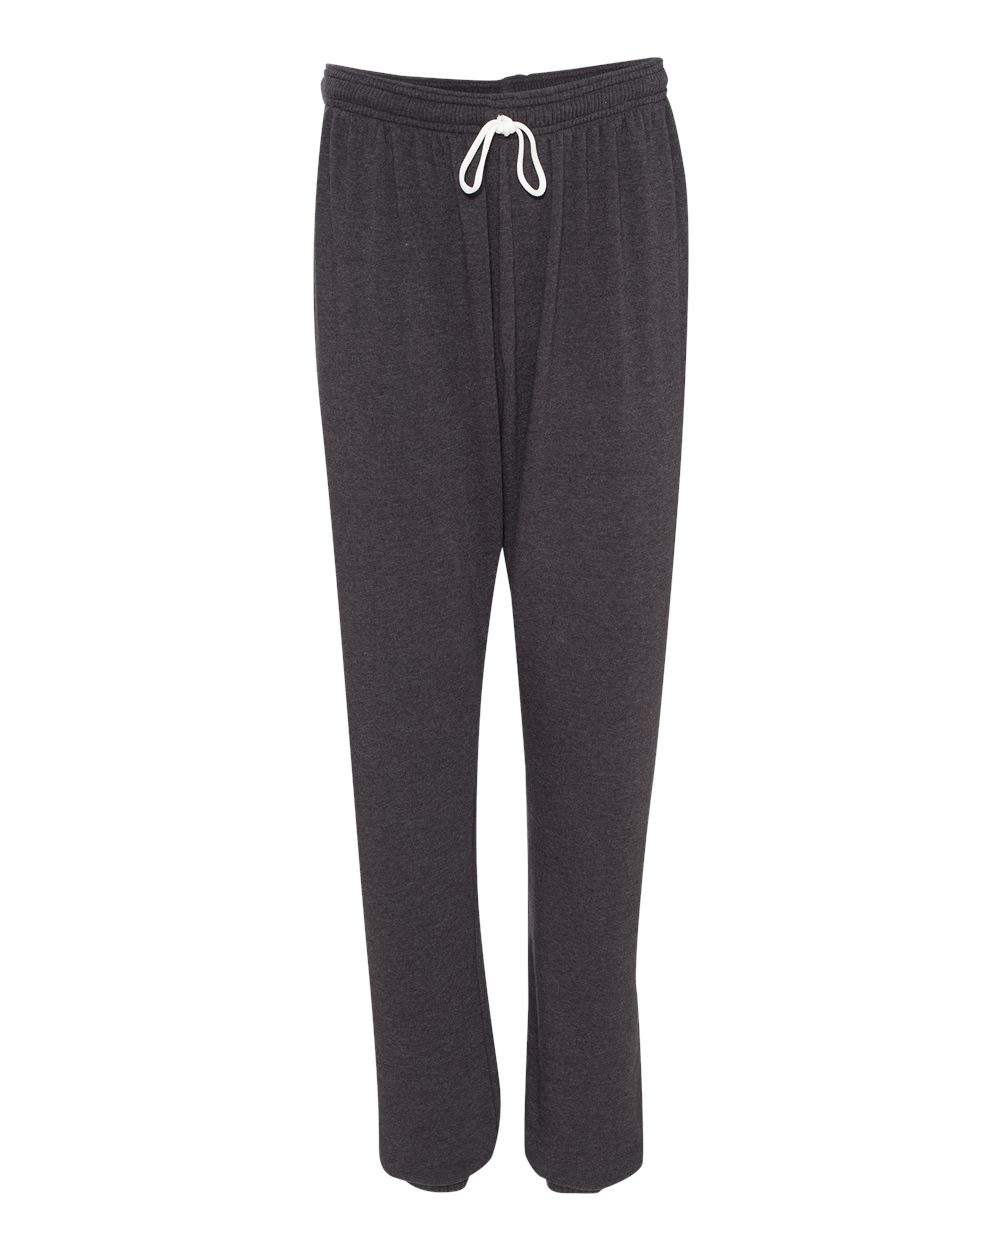 Bella-Canvas-Unisex-Long-Scrunch-Fleece-Pants-Workout-3737-up-to-2XL thumbnail 9